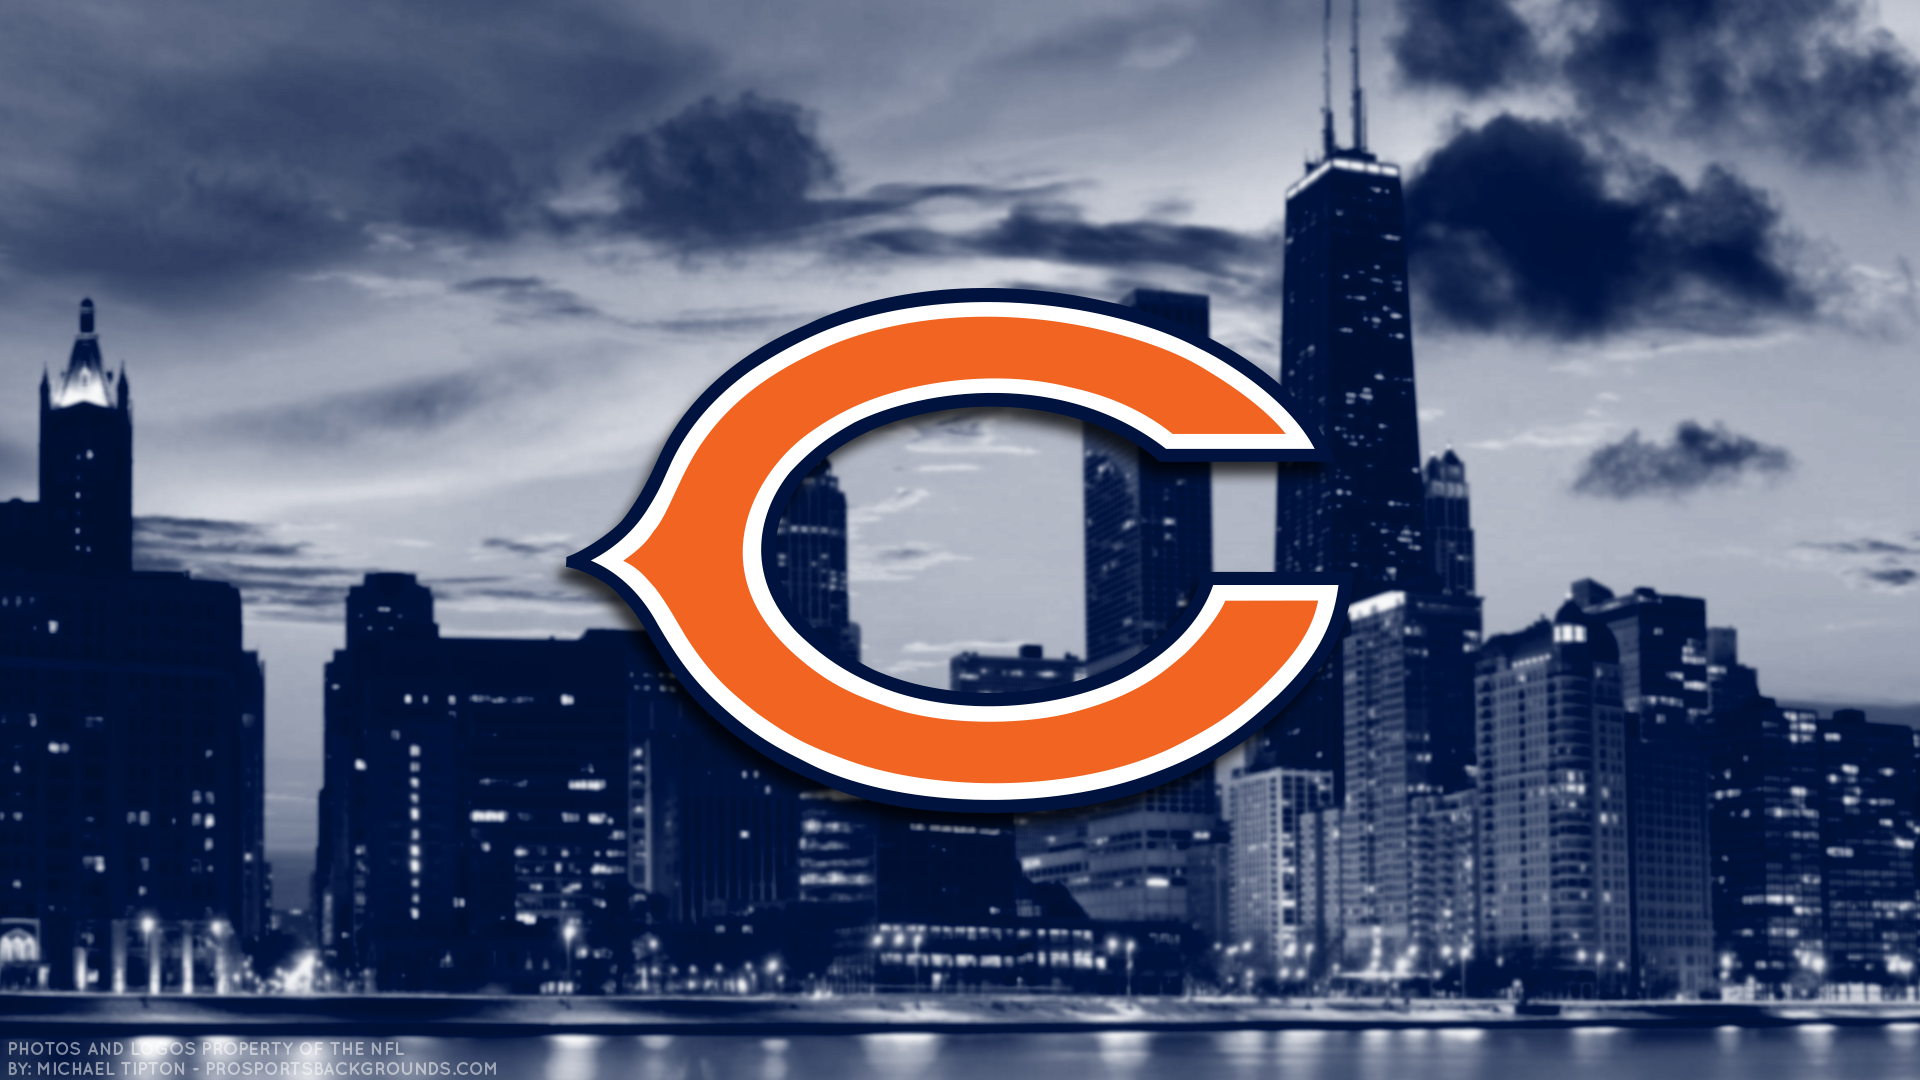 Moving Wallpaper for Chicago Bears Chicago bears